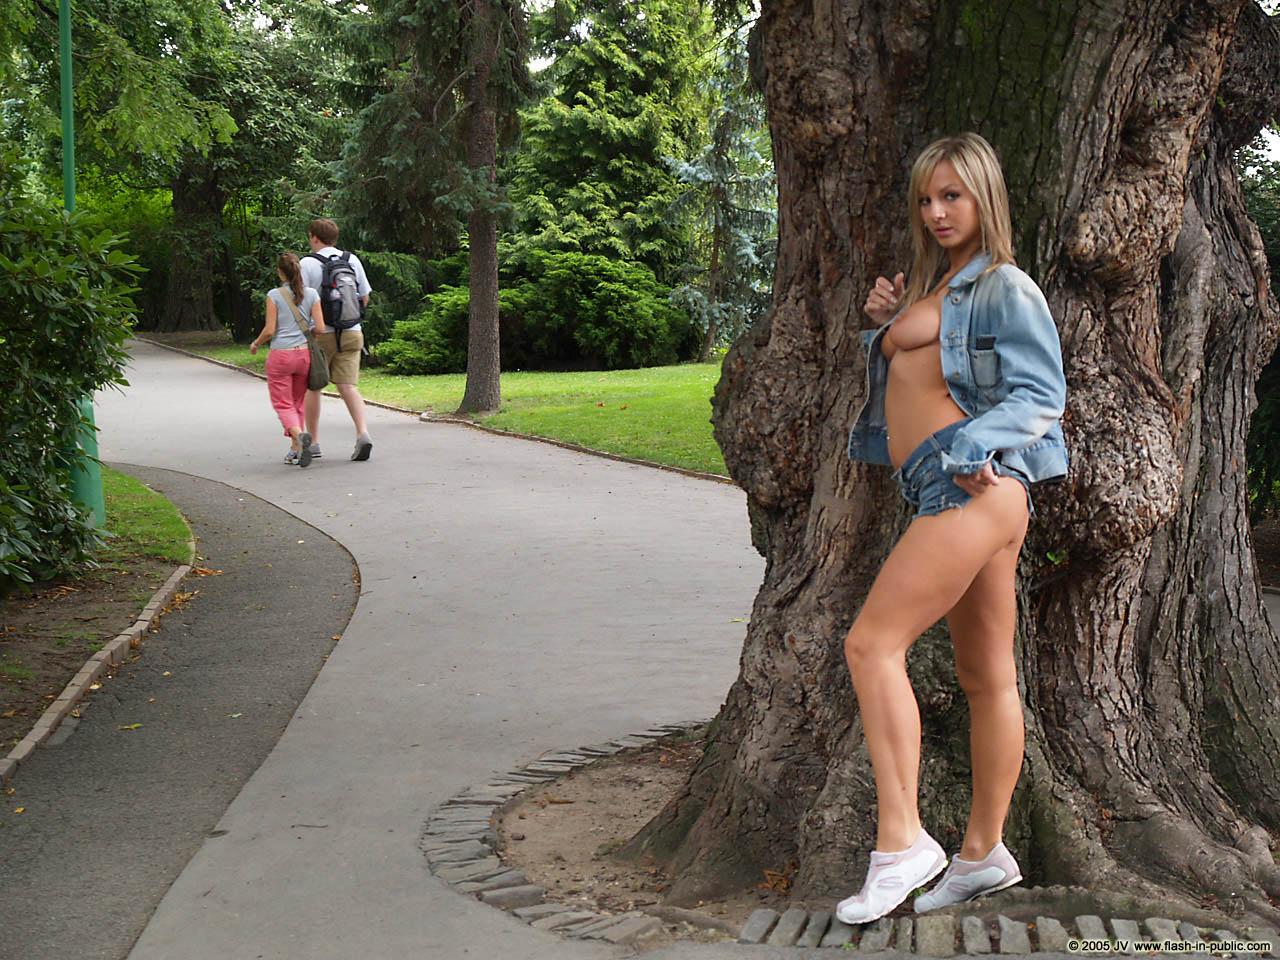 vendula-bednarova-jeans-miniskirt-flash-in-public-21